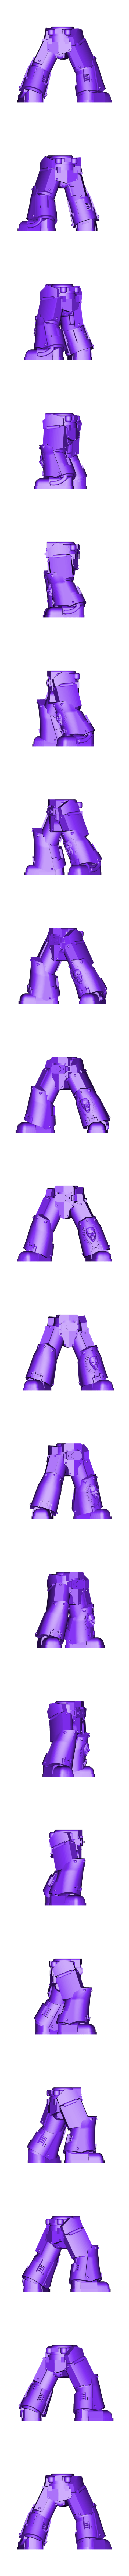 legs_4_repaired.stl Download free STL file 1000 Followers! 3rd Legion - FireBird Terminators • 3D printing model, ThatEvilOne